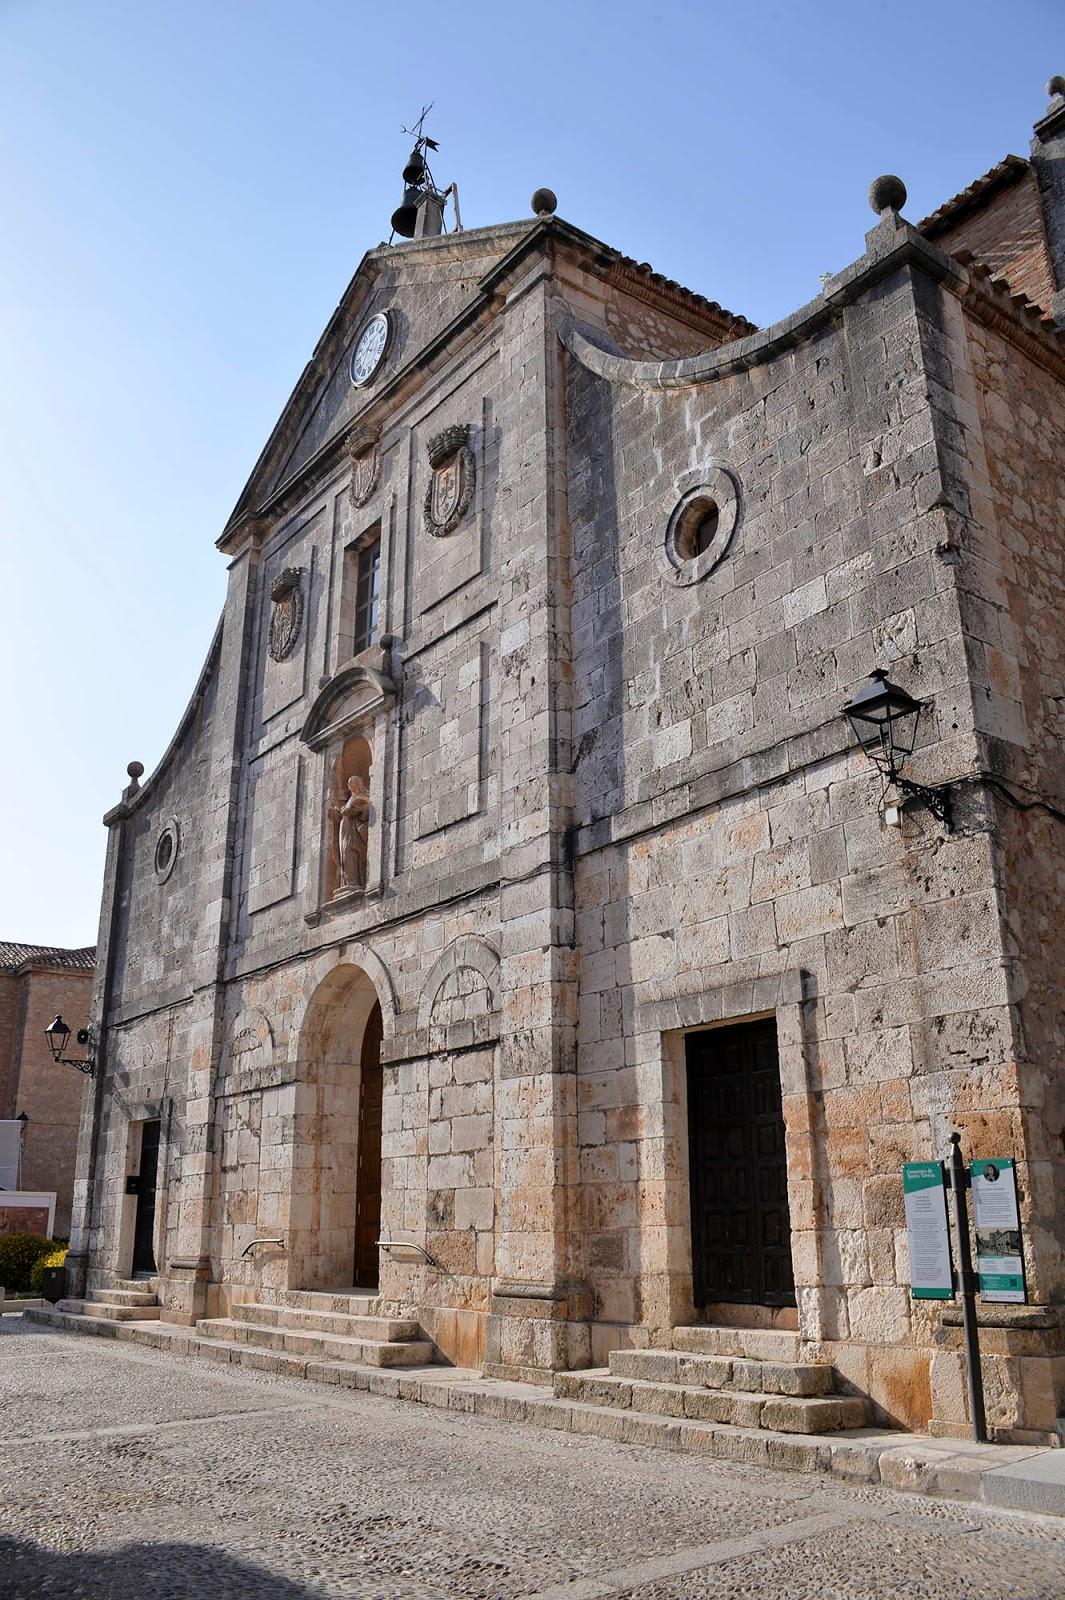 lerma burgos spain castile leon church beautiful village